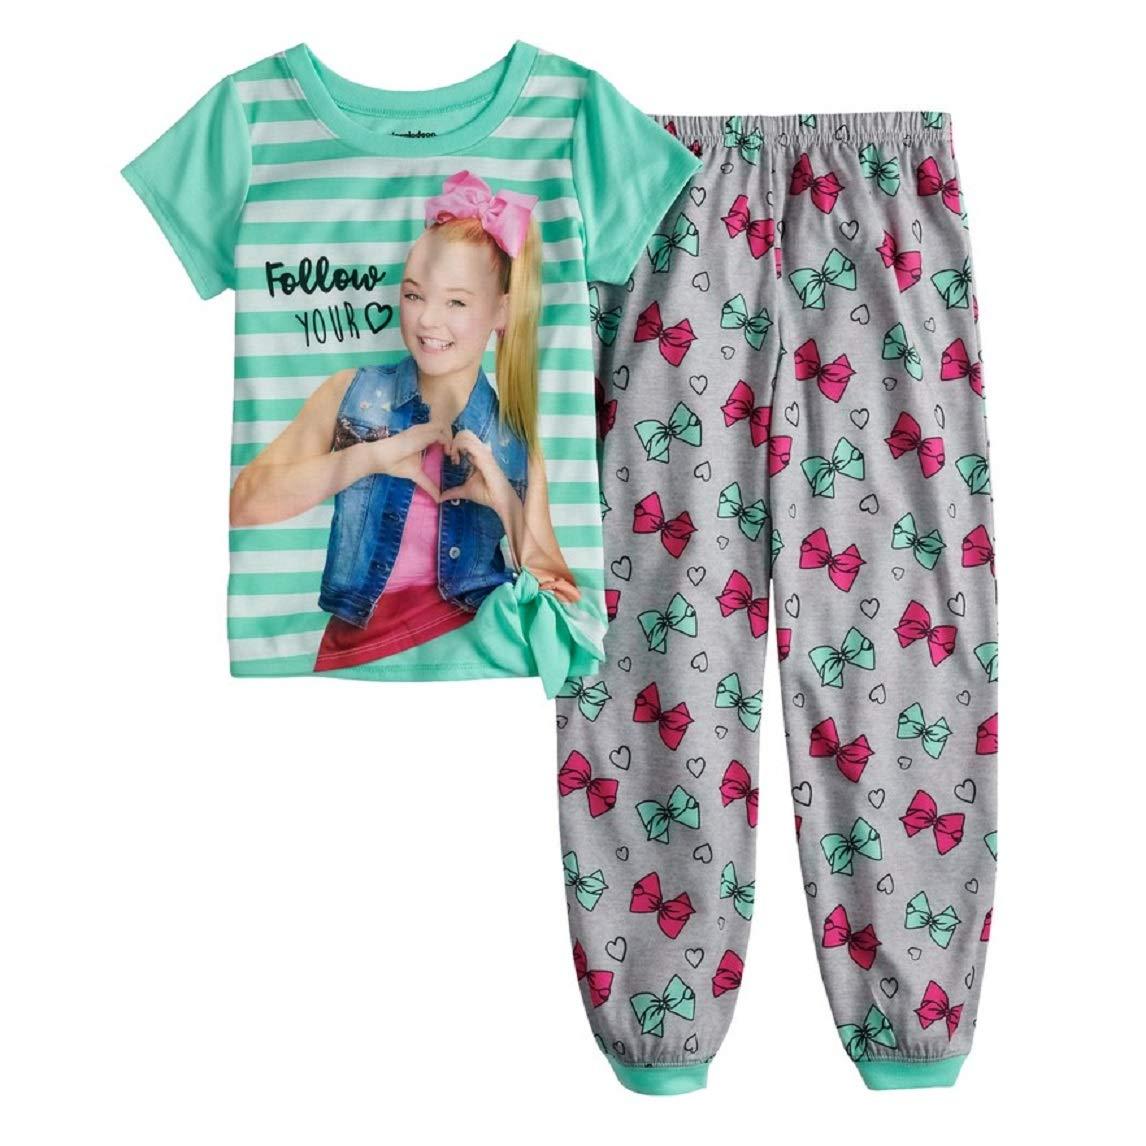 AME Girls JoJo Siwa Top /& Bottoms Pajama Set 6-12